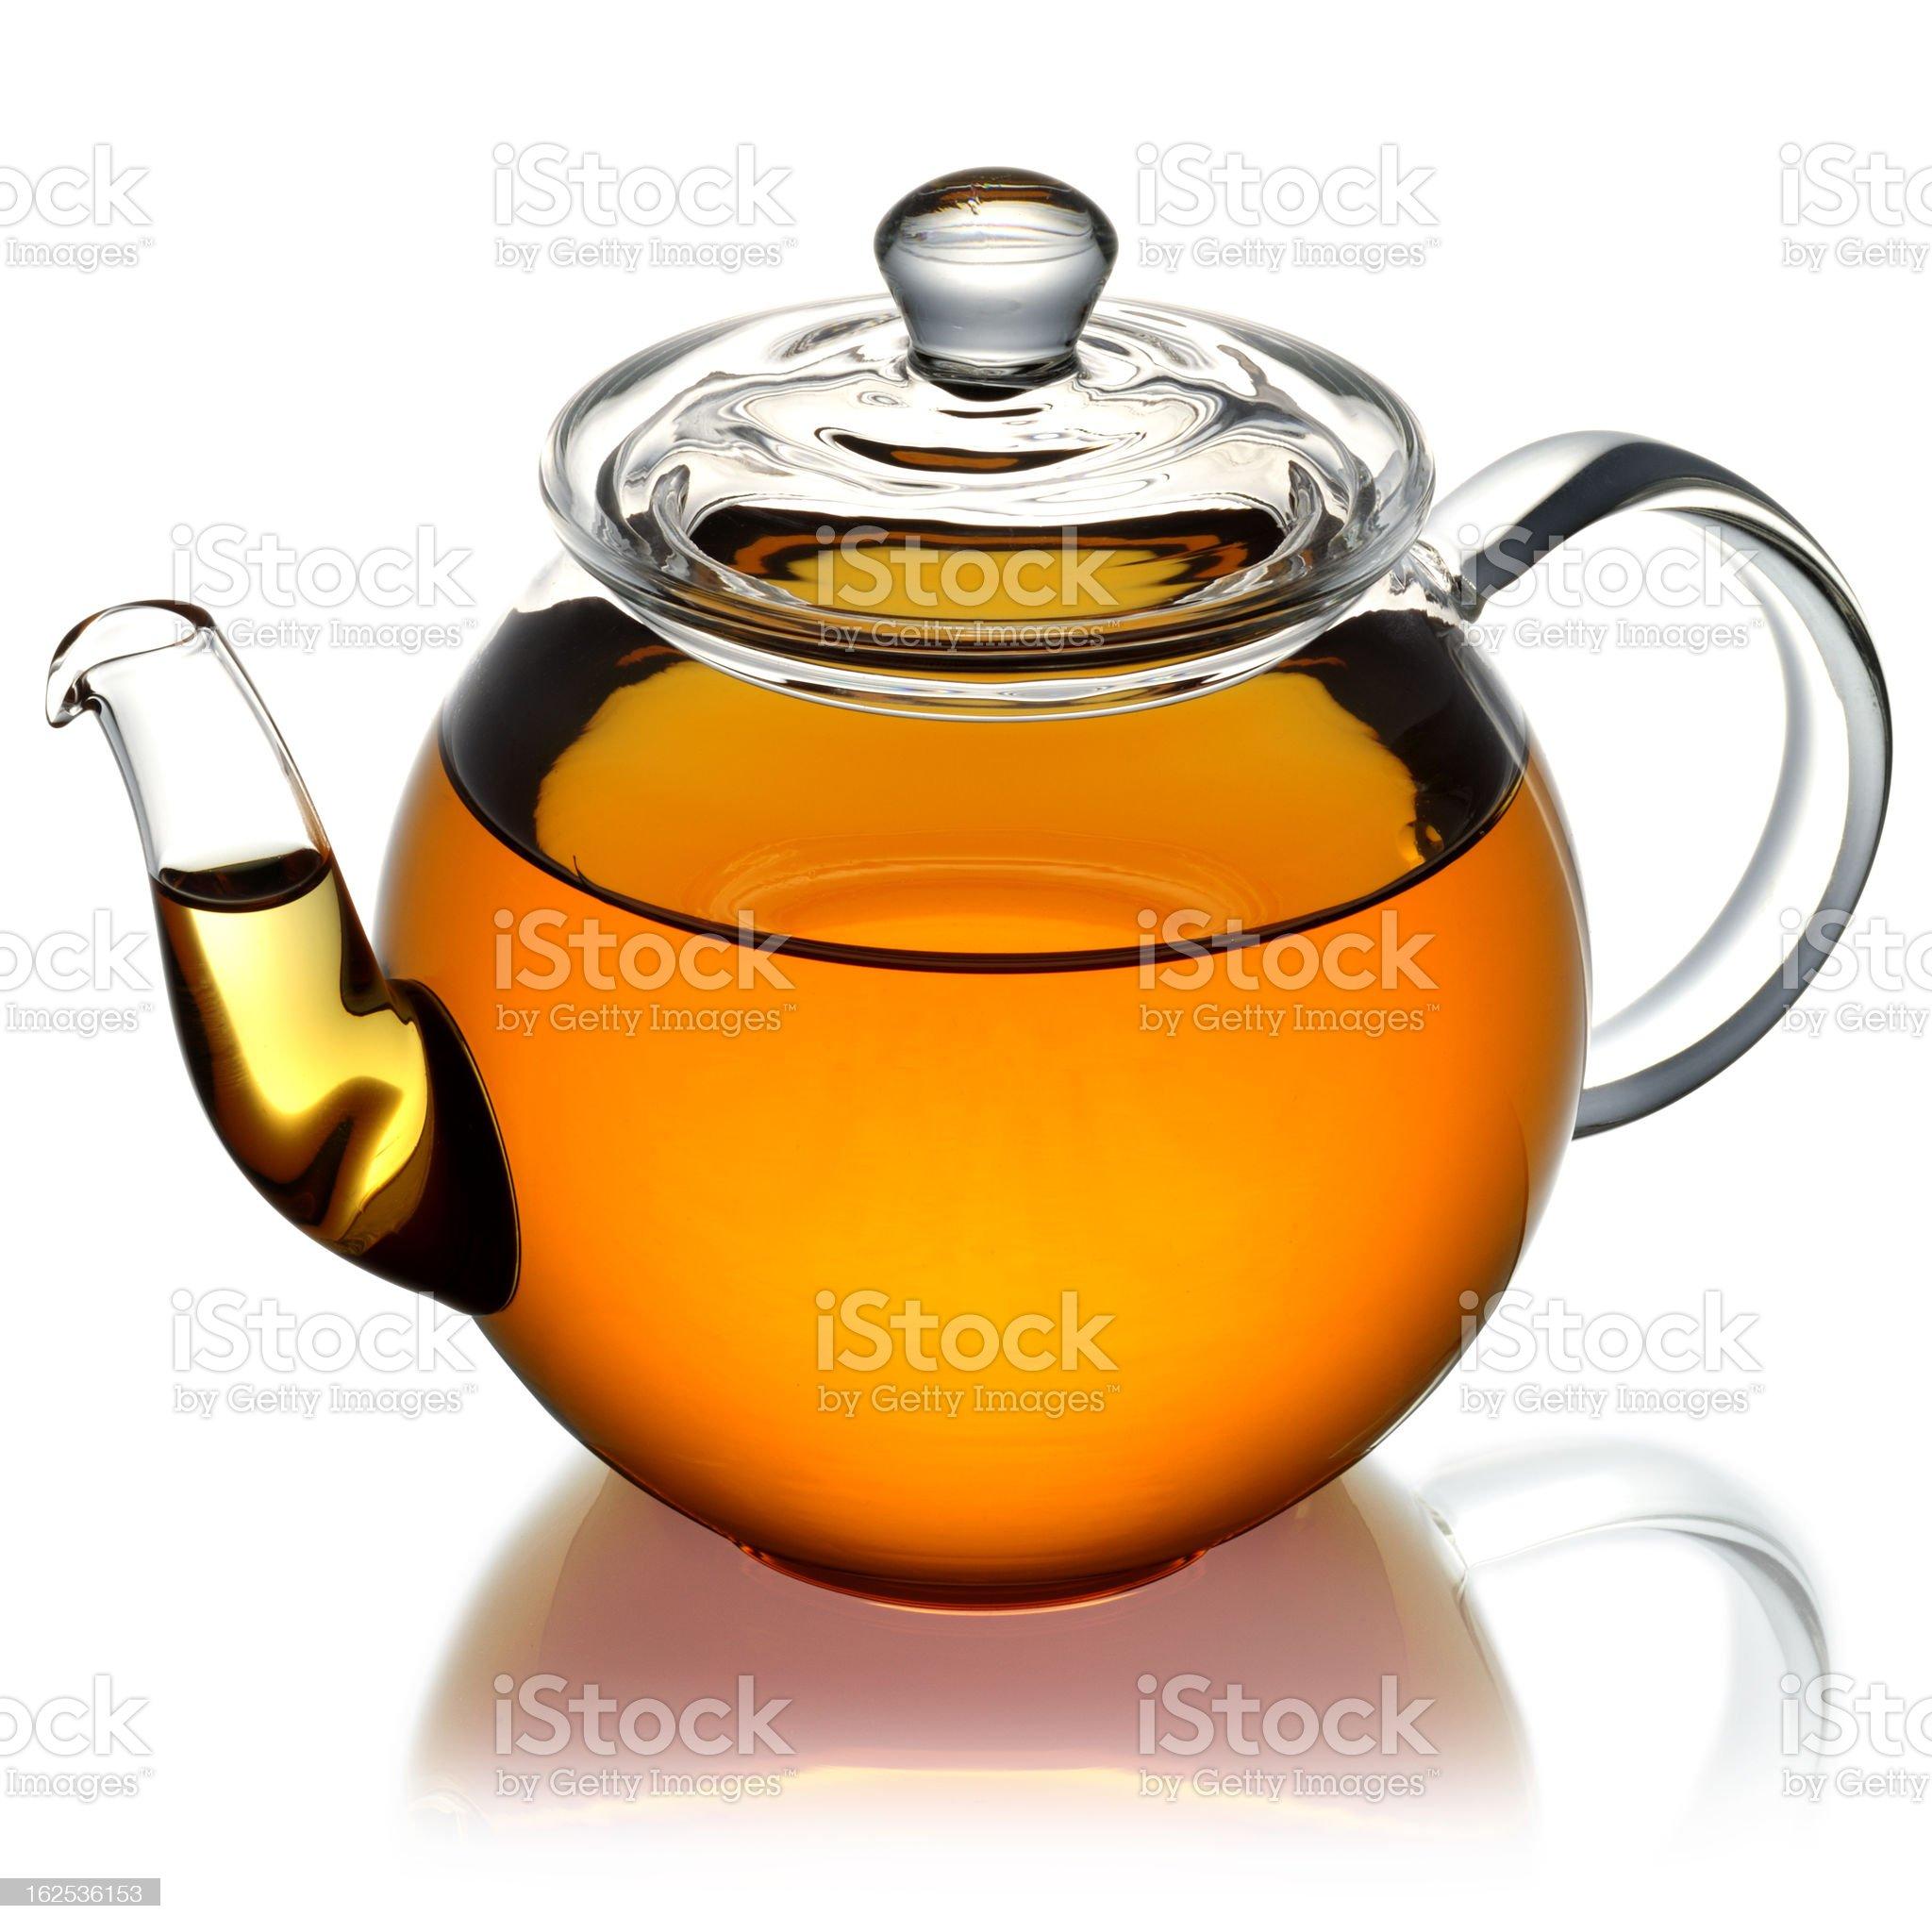 Teapot isolated royalty-free stock photo